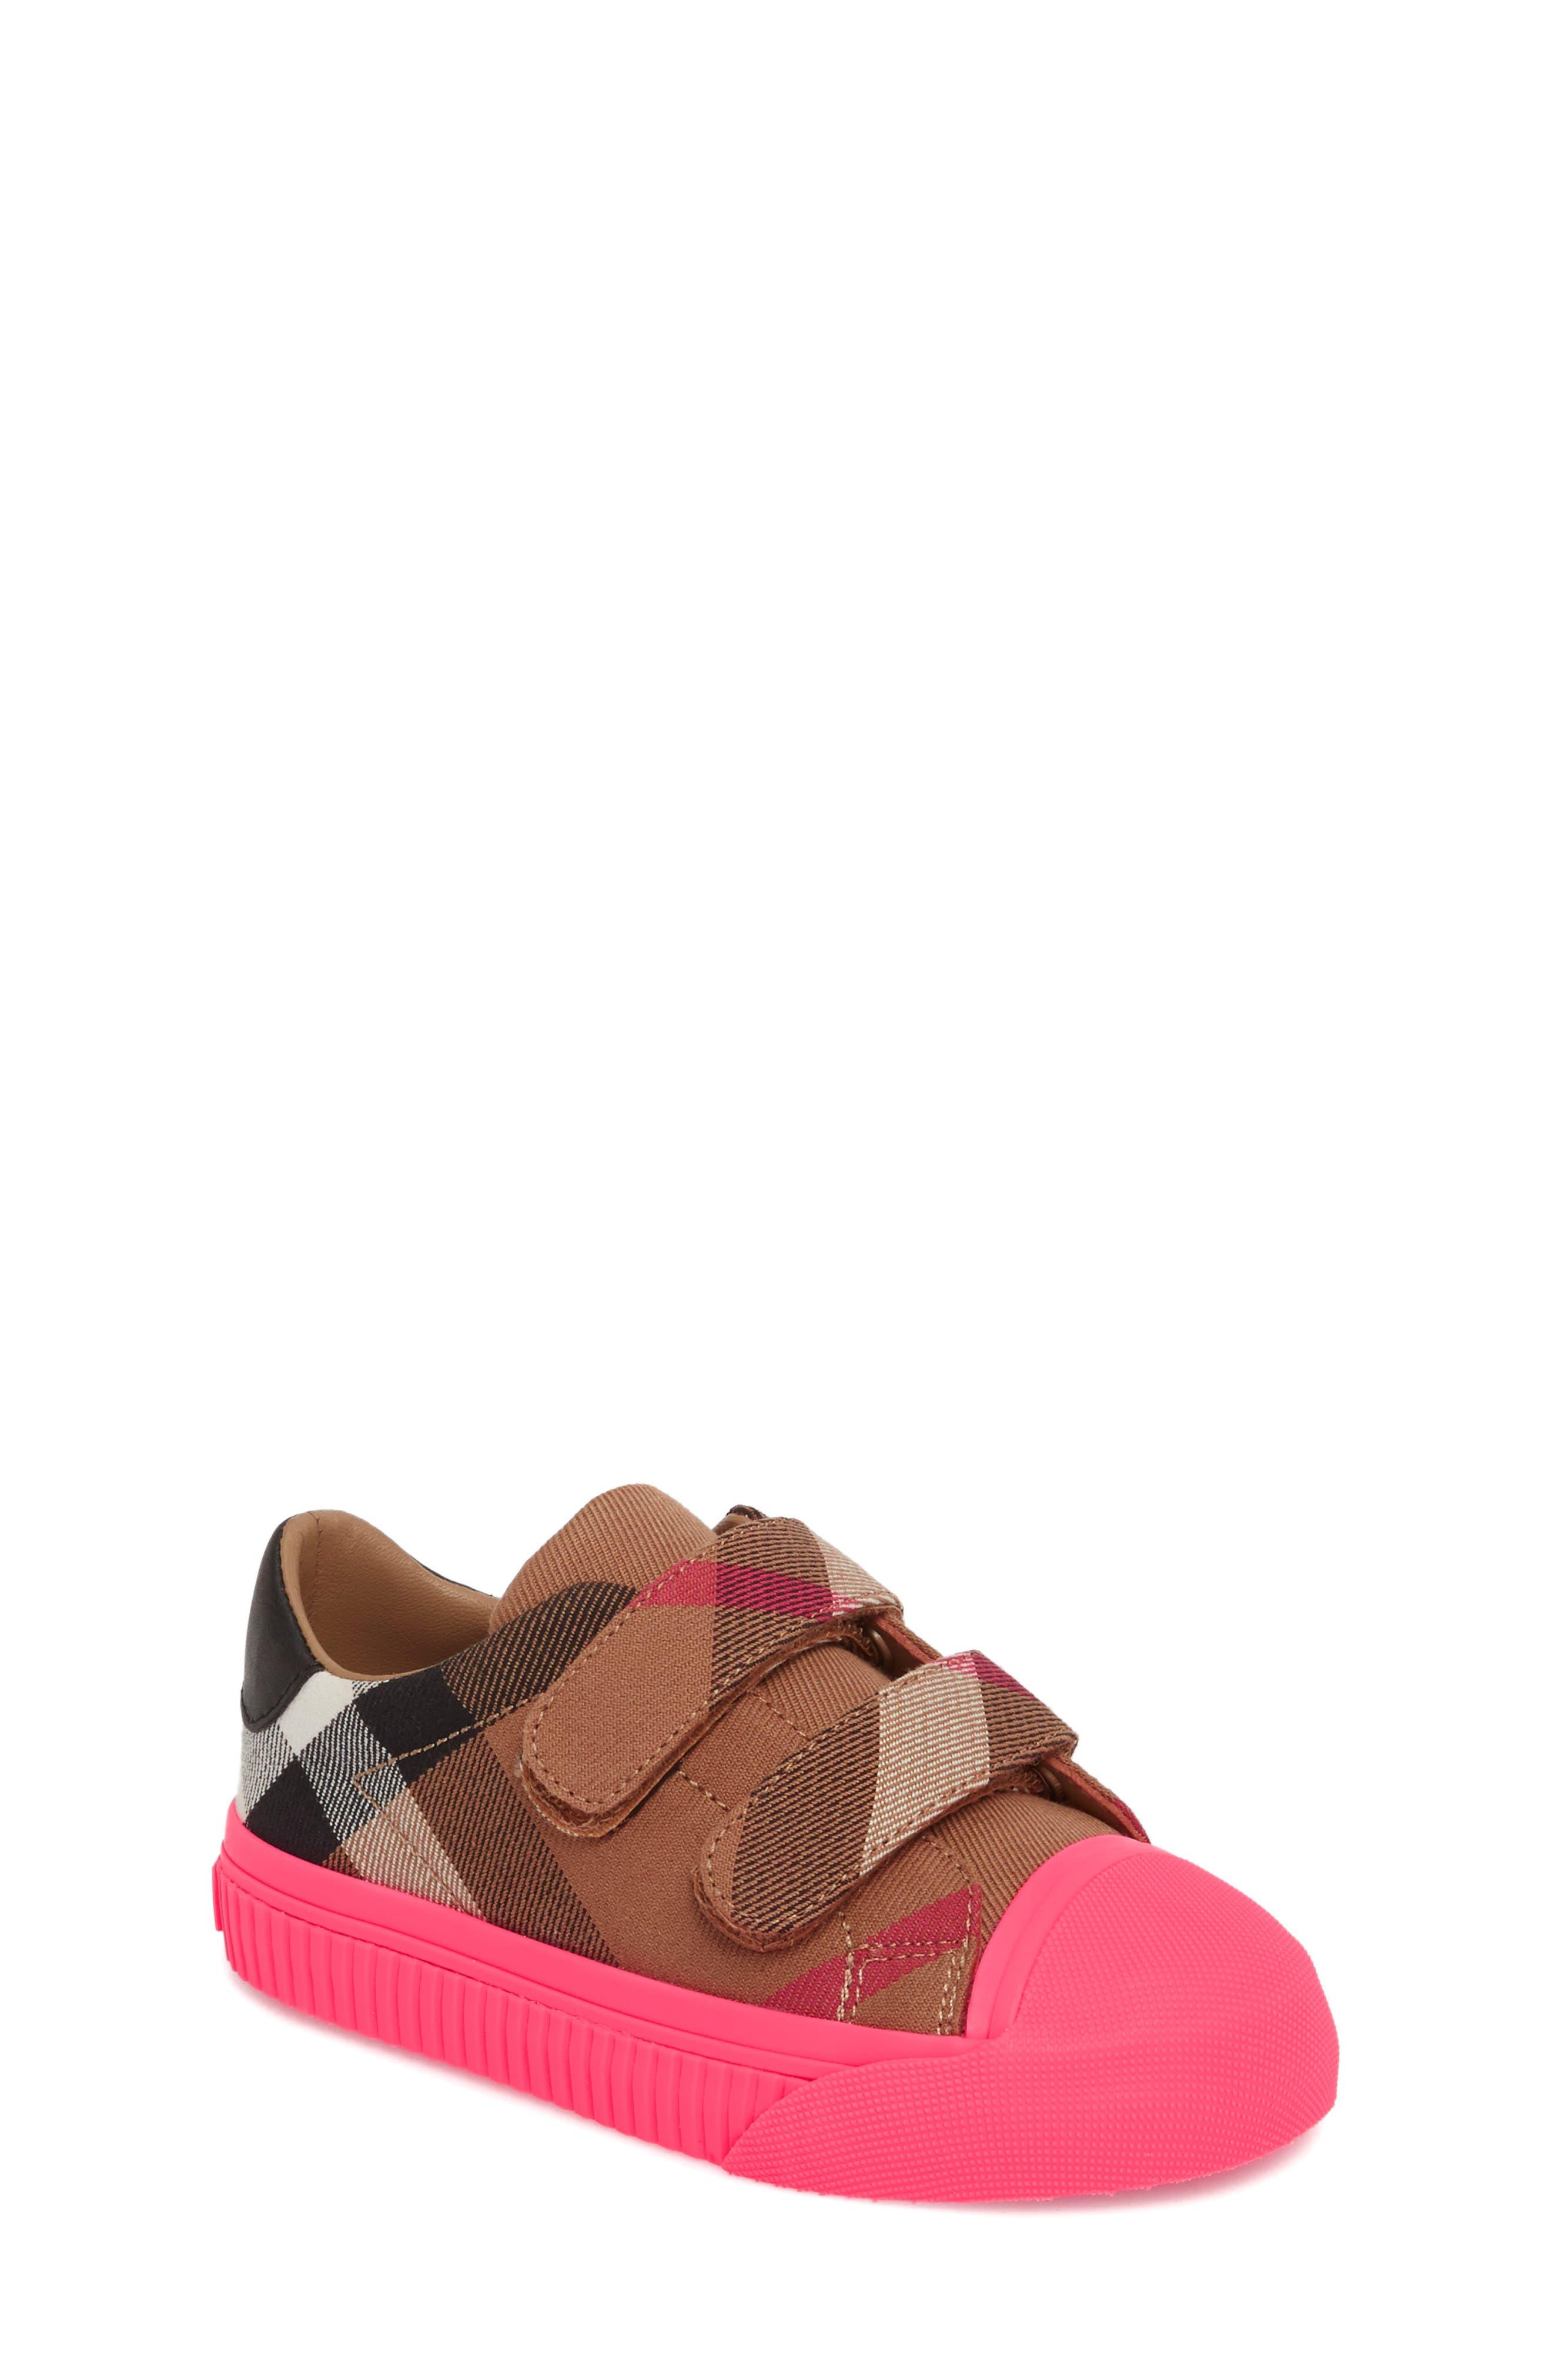 Belside Sneaker,                             Main thumbnail 1, color,                             671